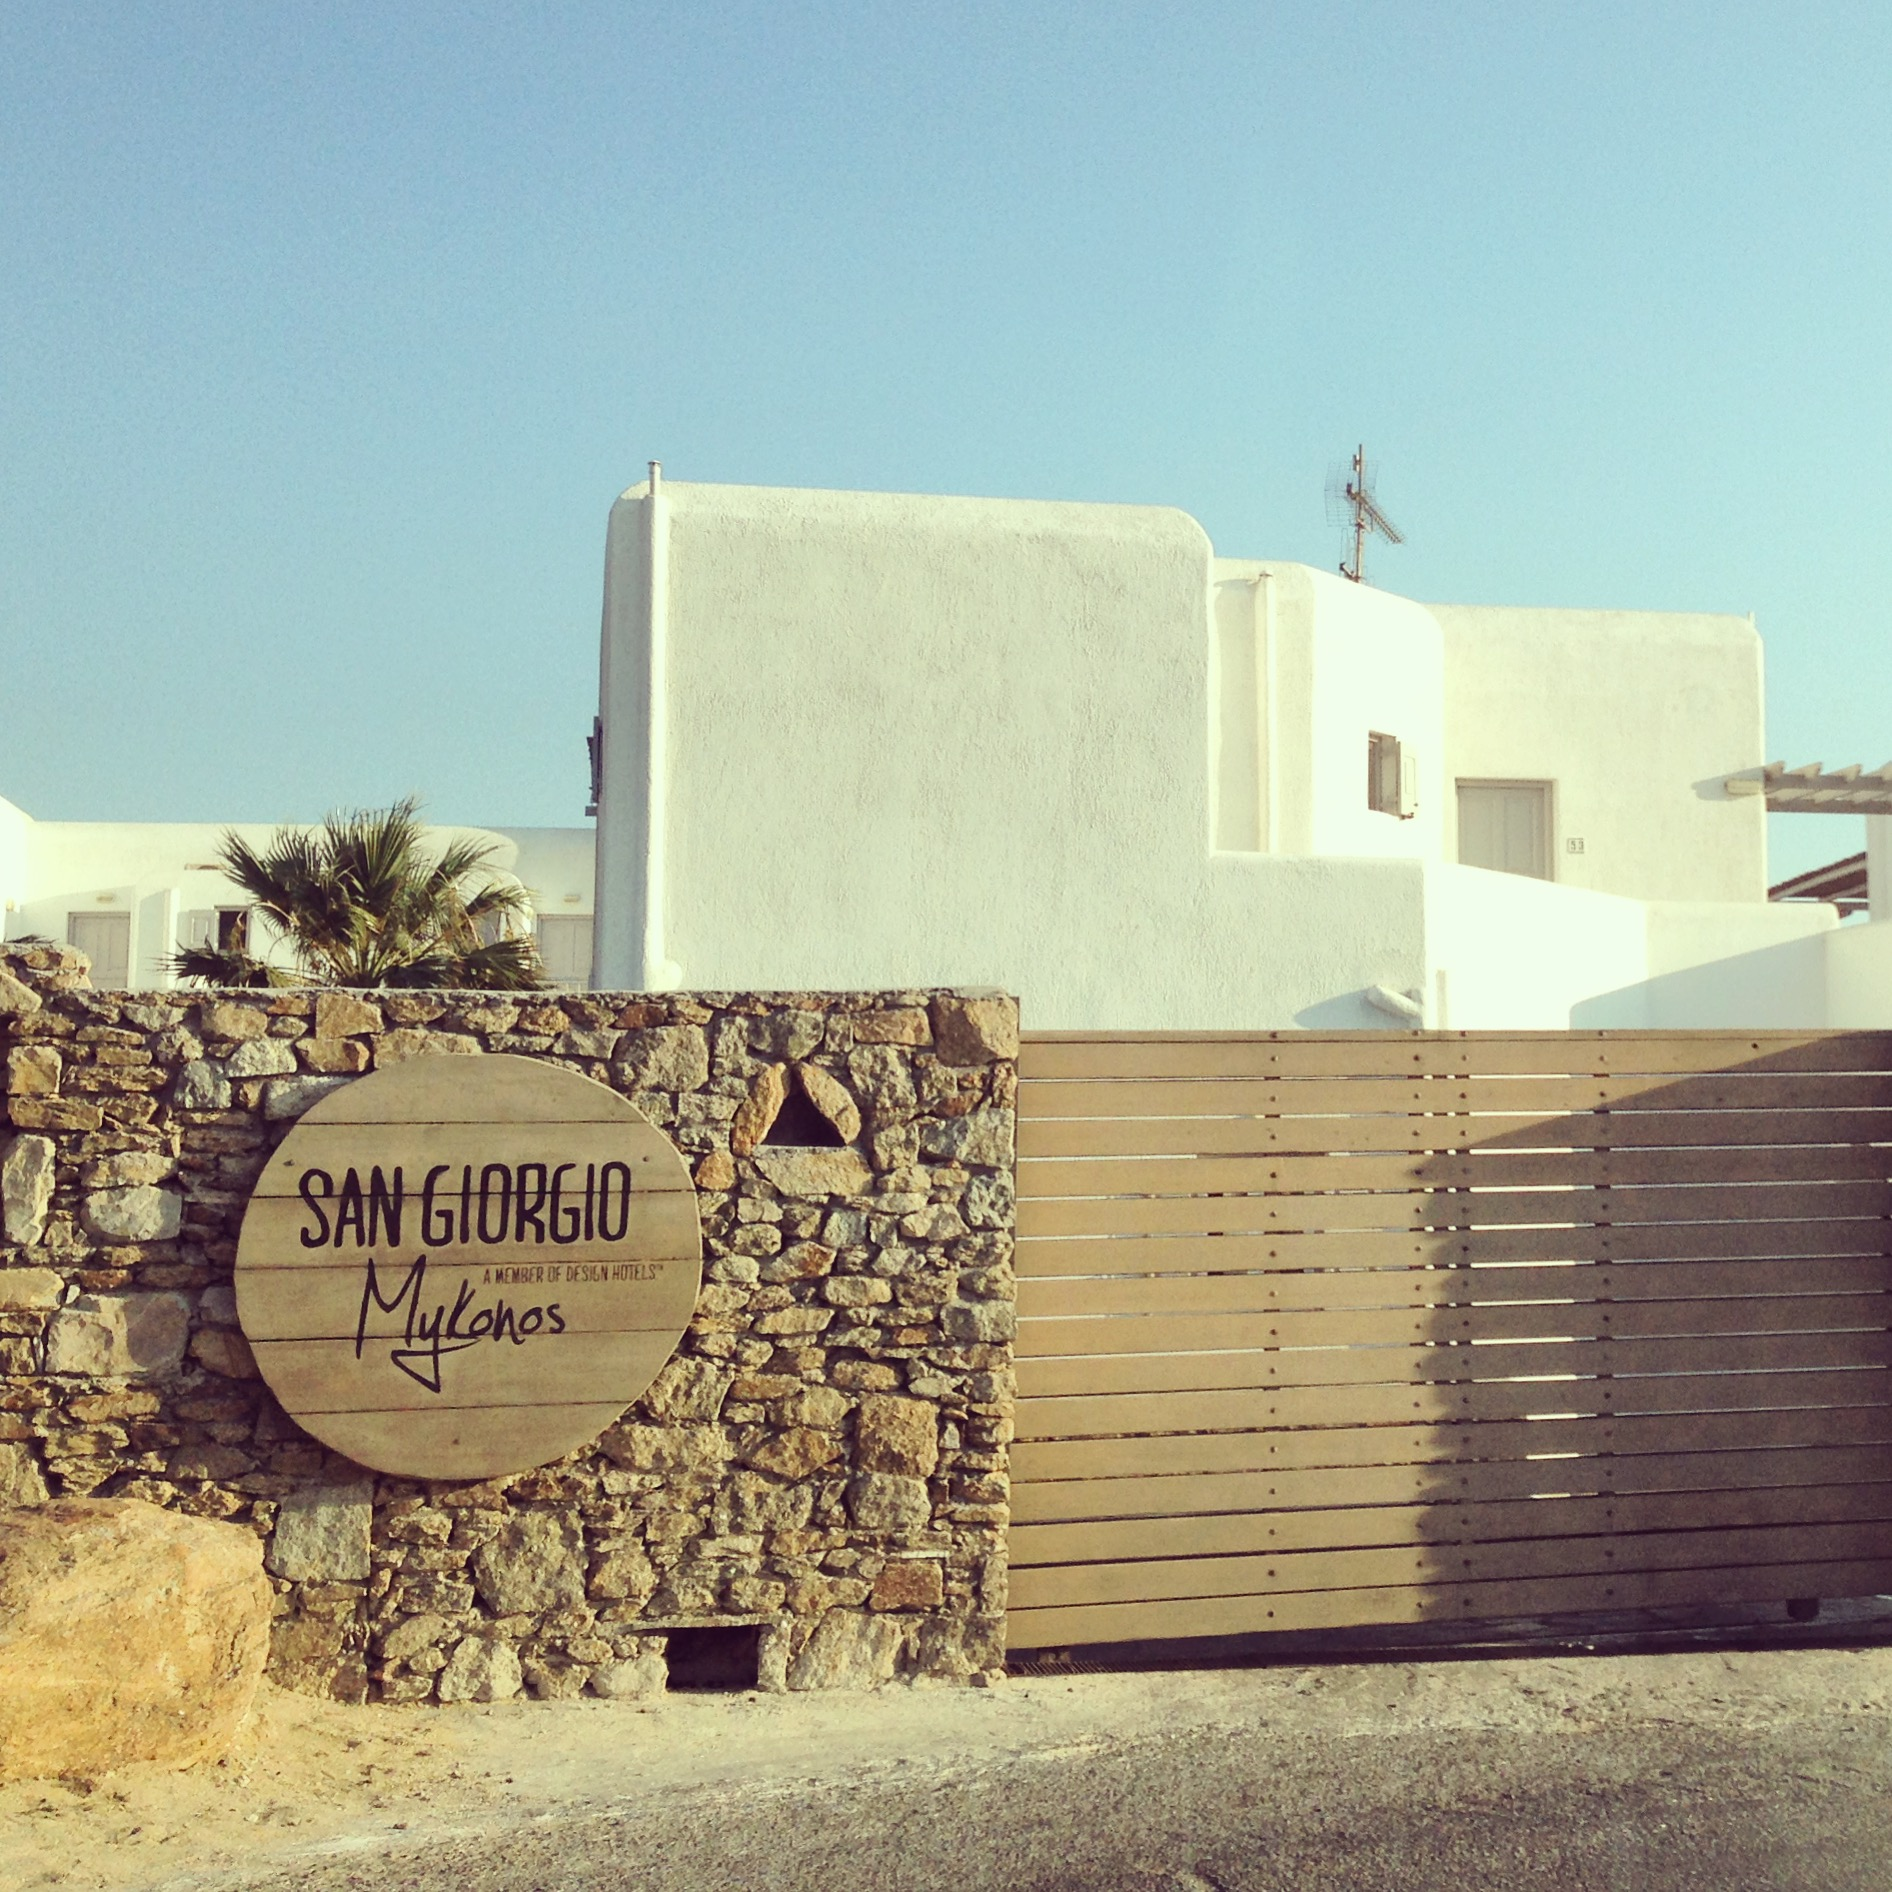 mykonos_san_giorgio_hotel_fancyoli